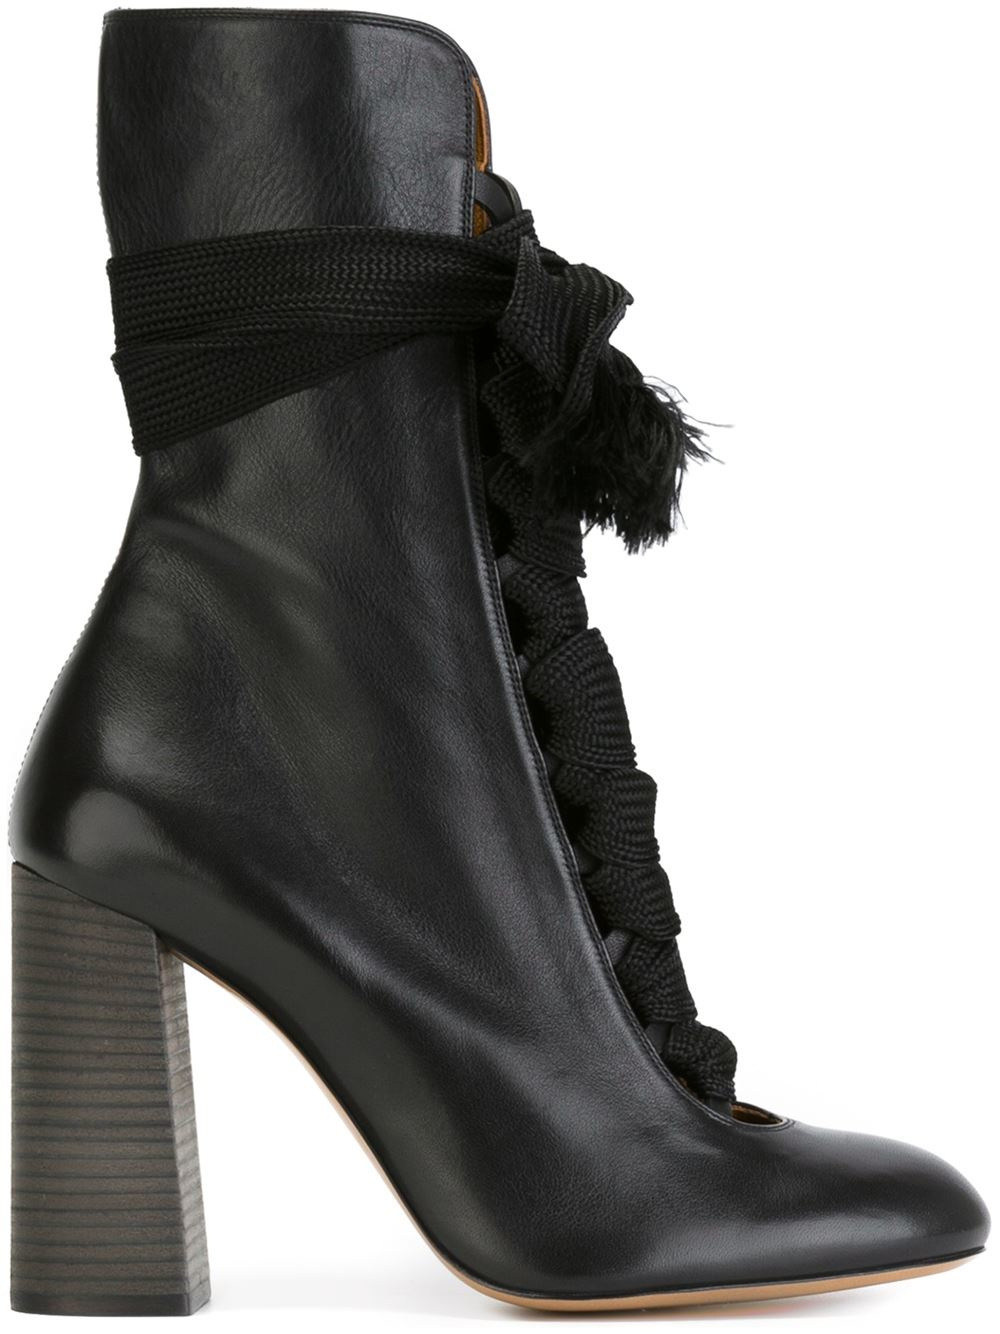 Chlo 233 Harper Boots In Black Lyst